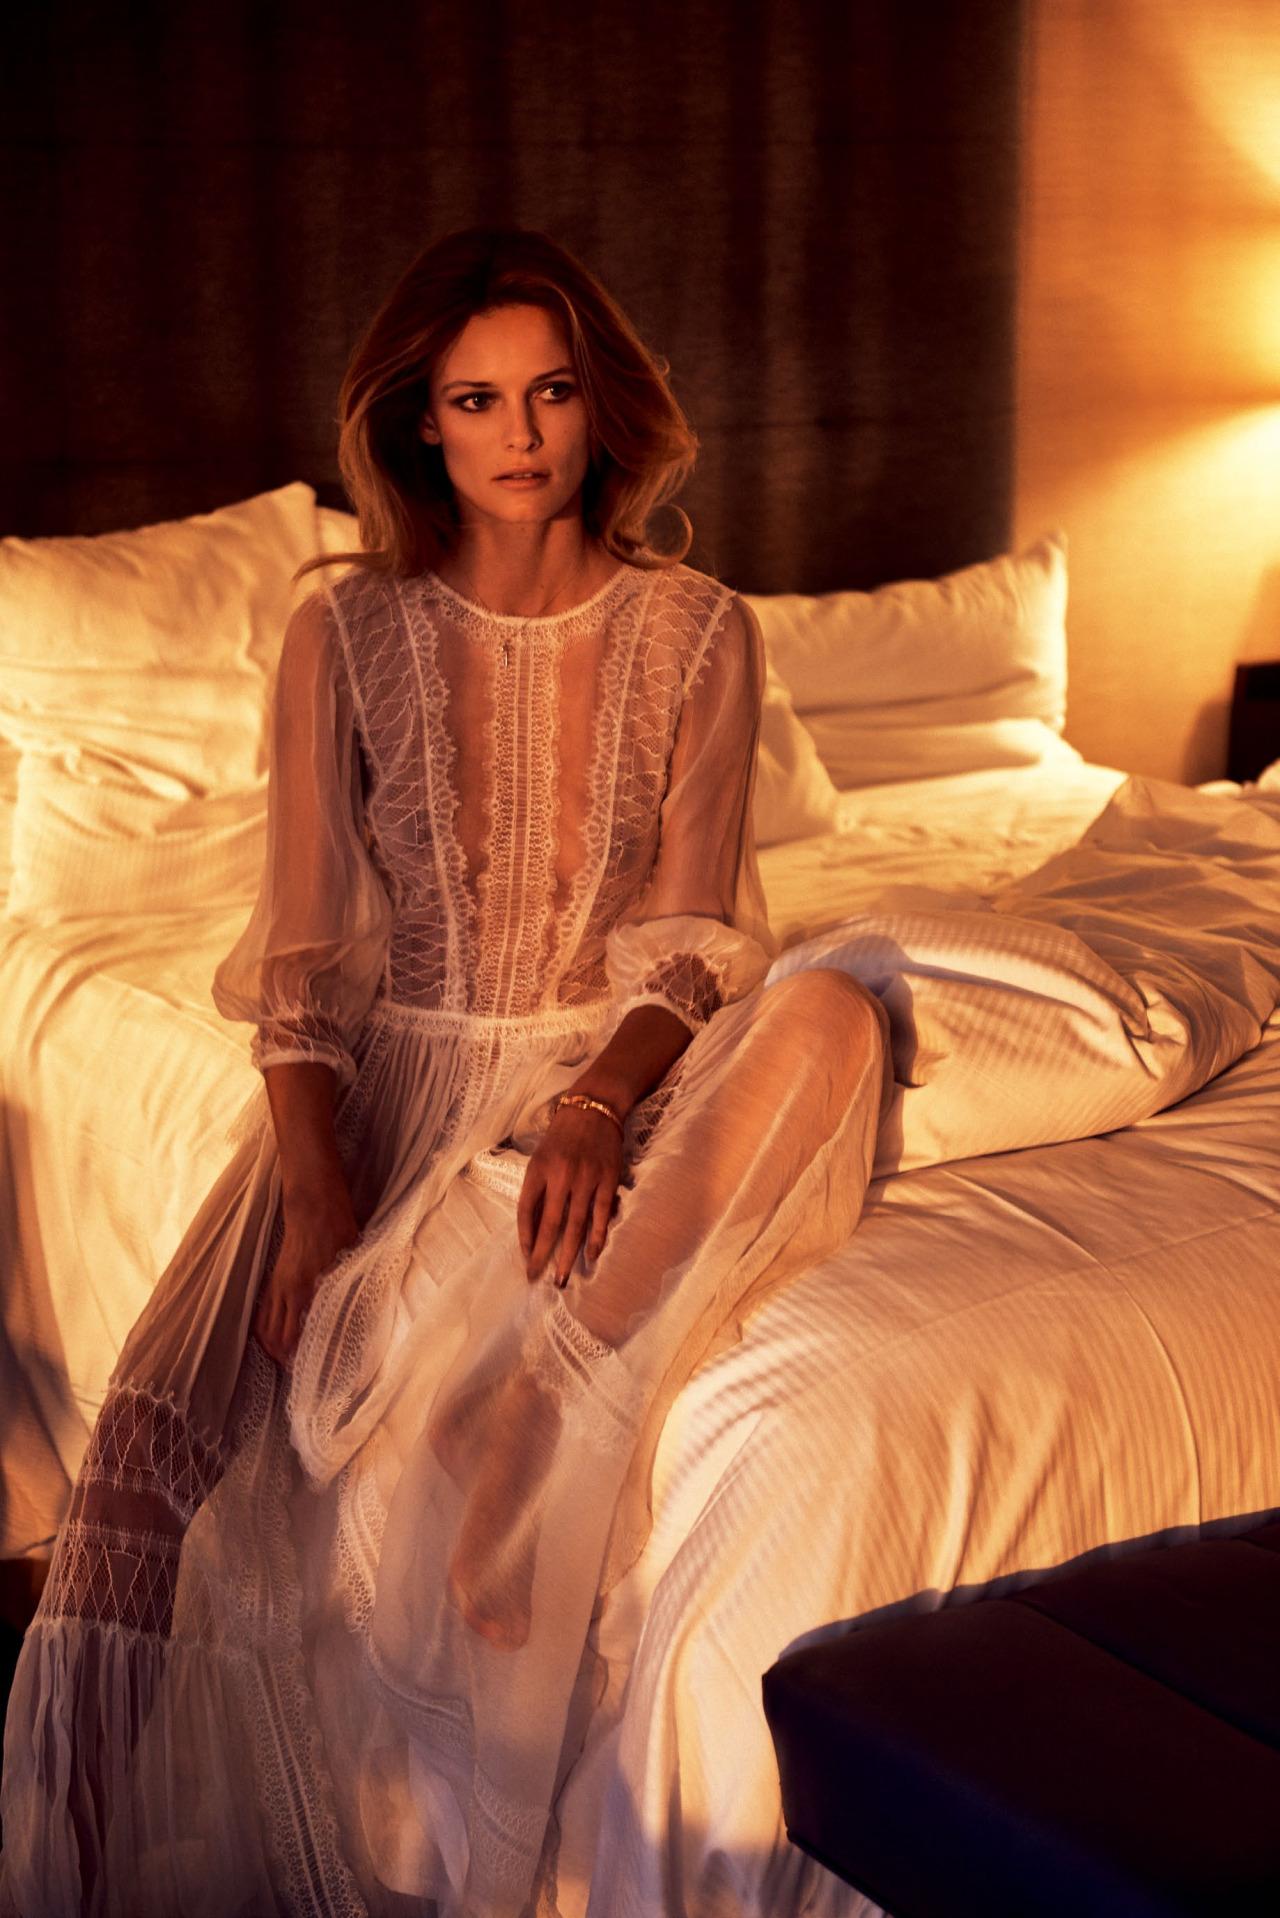 Vogue Japan July 2016 Edita Vilkeviciute by Lachlan Bailey